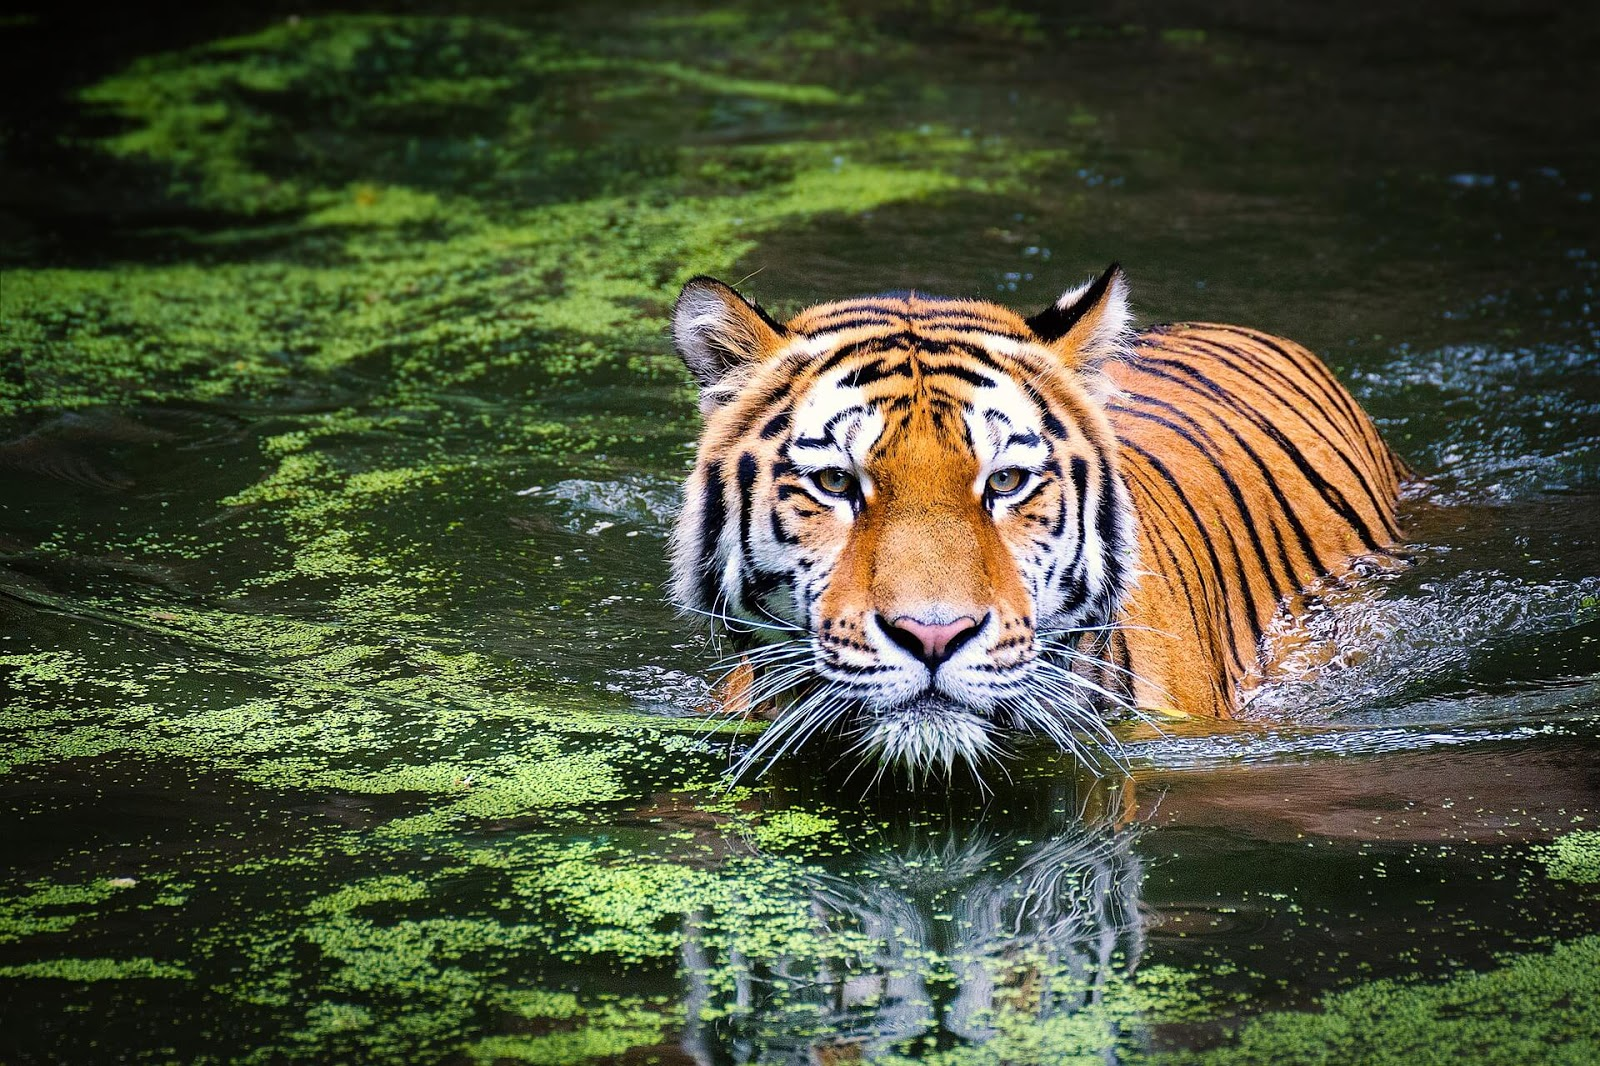 tiger wallpaper hd 1366x768